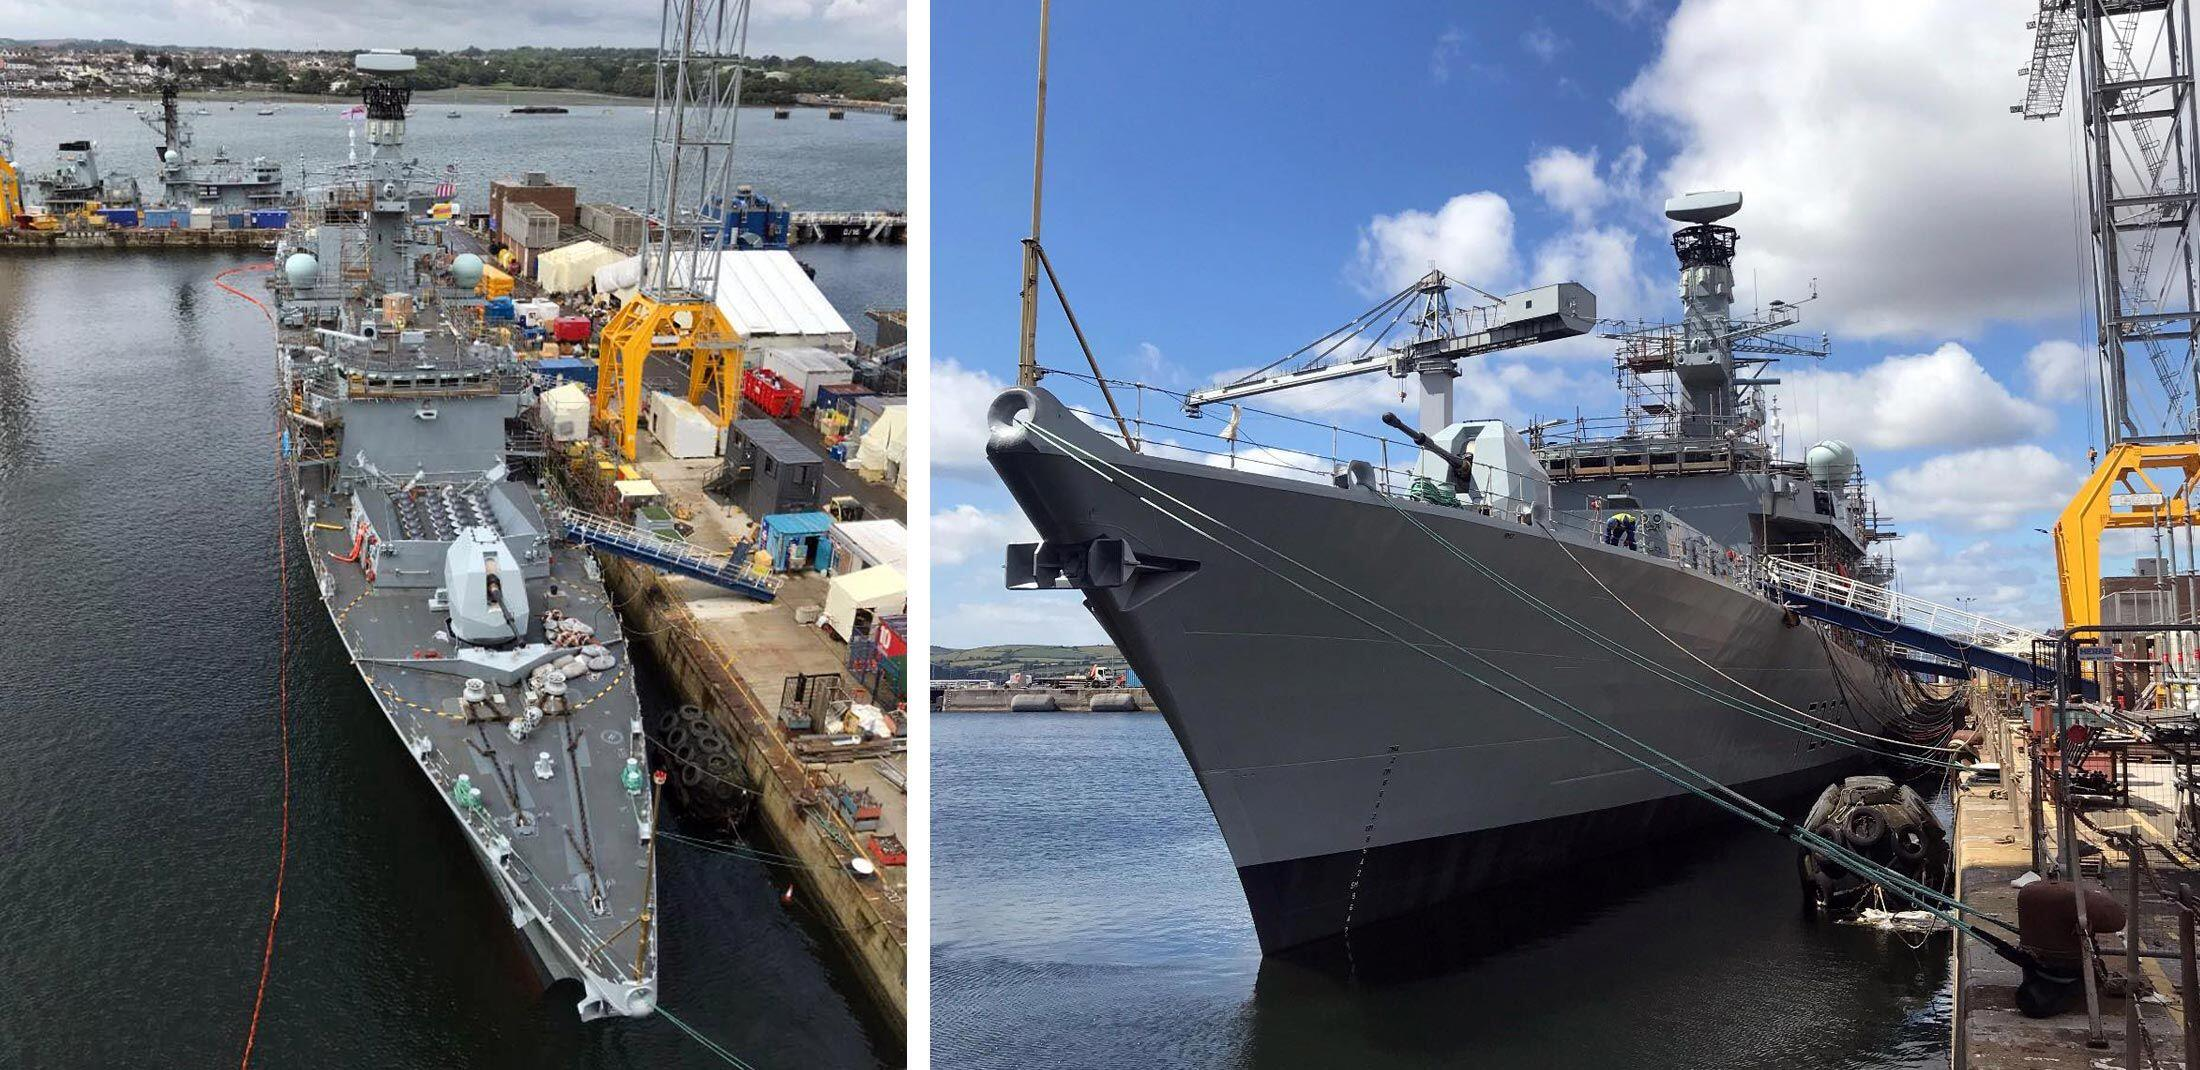 HMS Richmond Devonport